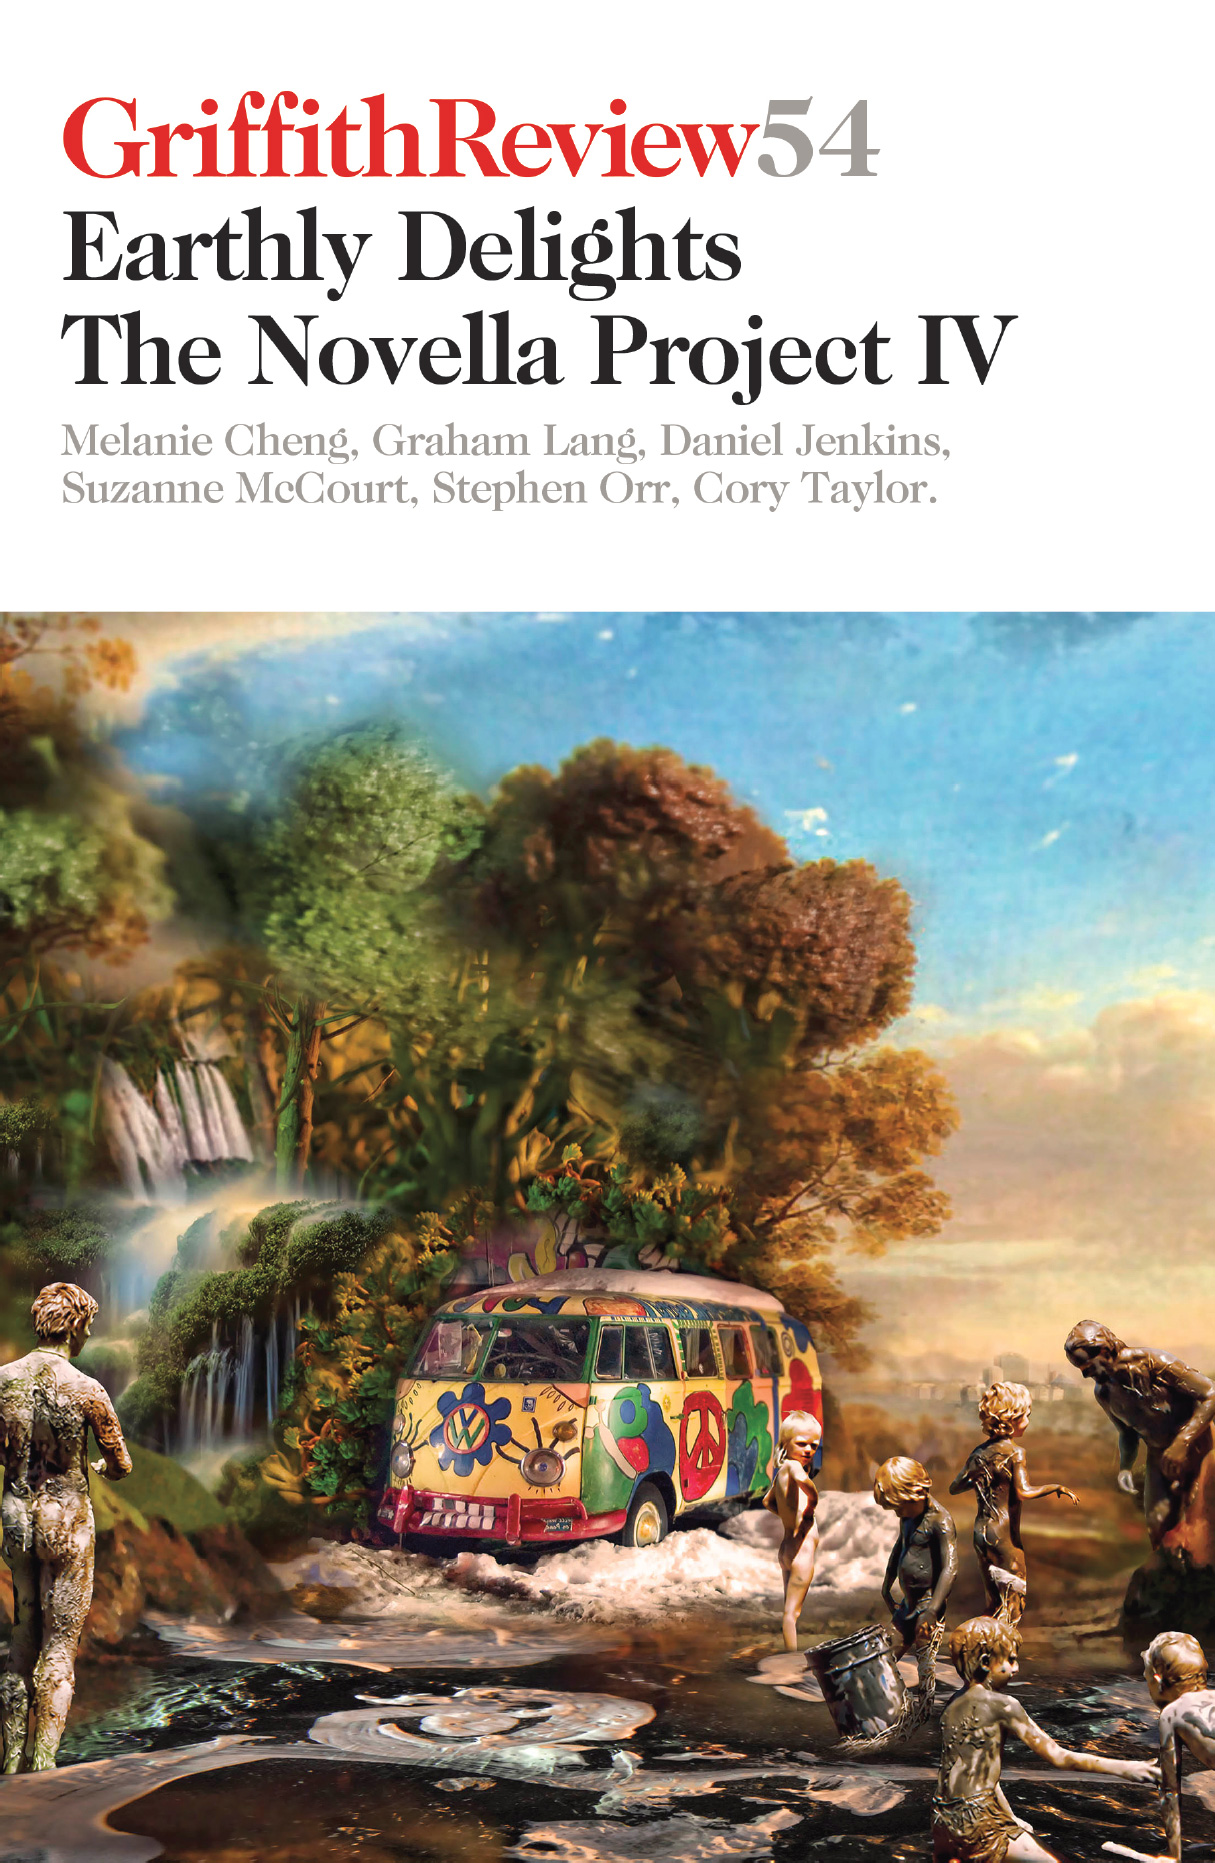 The Novella Project IV